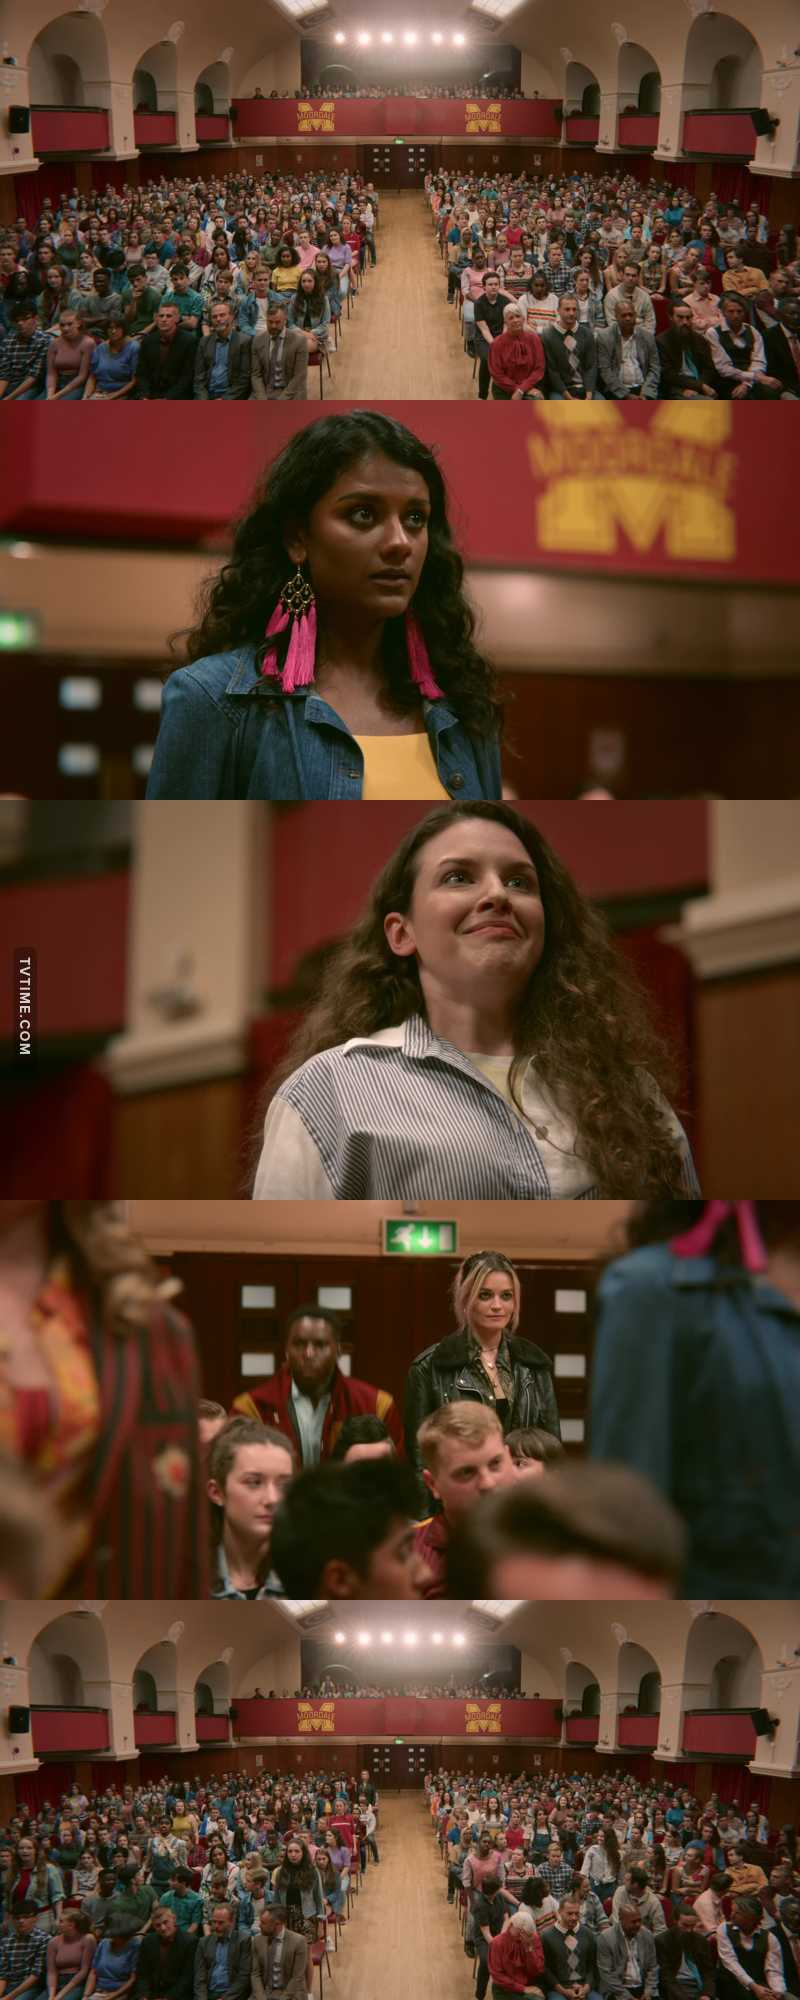 """It's my vagina"". This scene was amazing!"